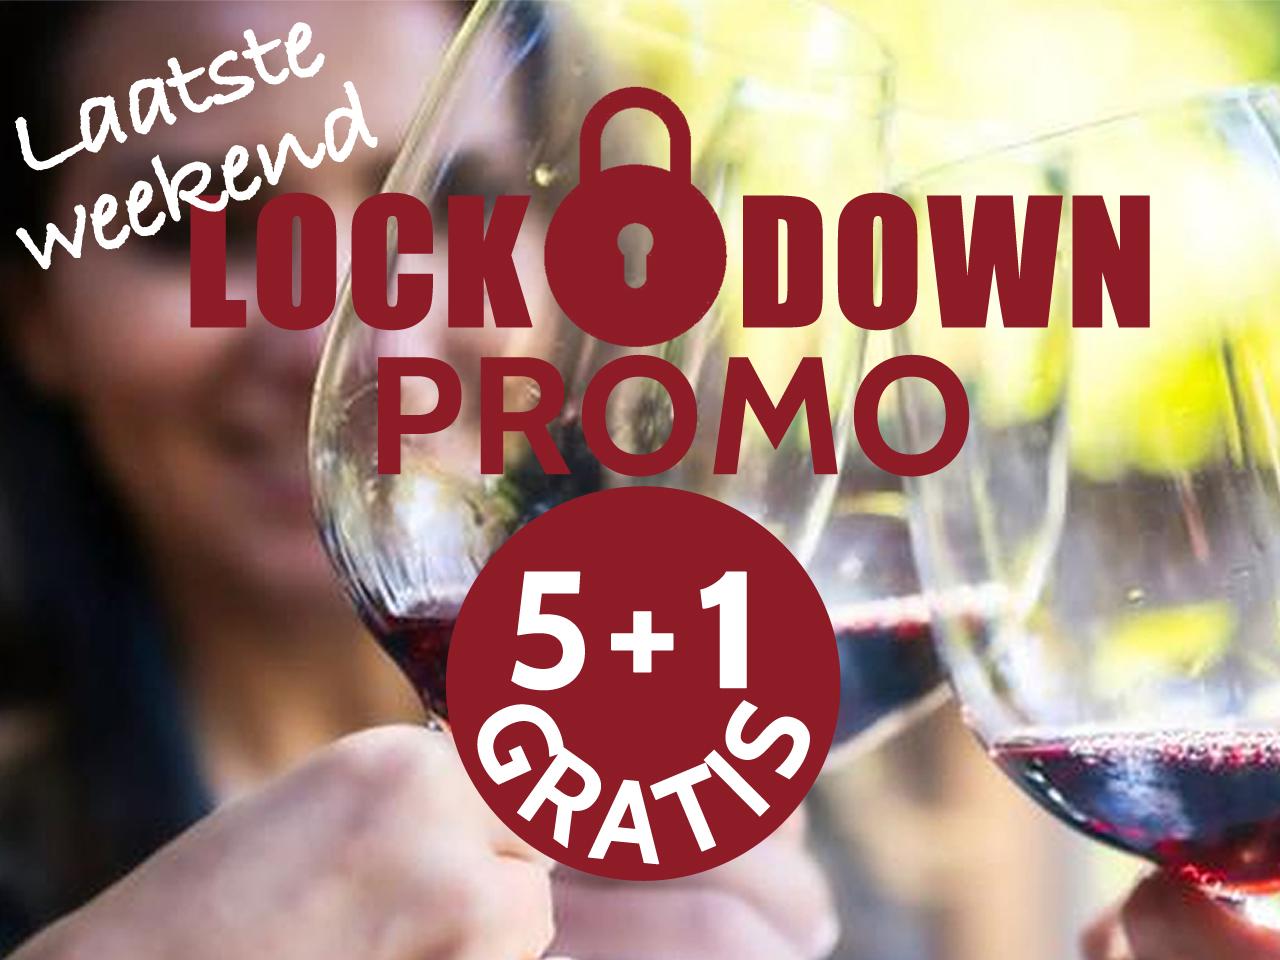 paaswijnen promo 5 + 1 gratis lockdown